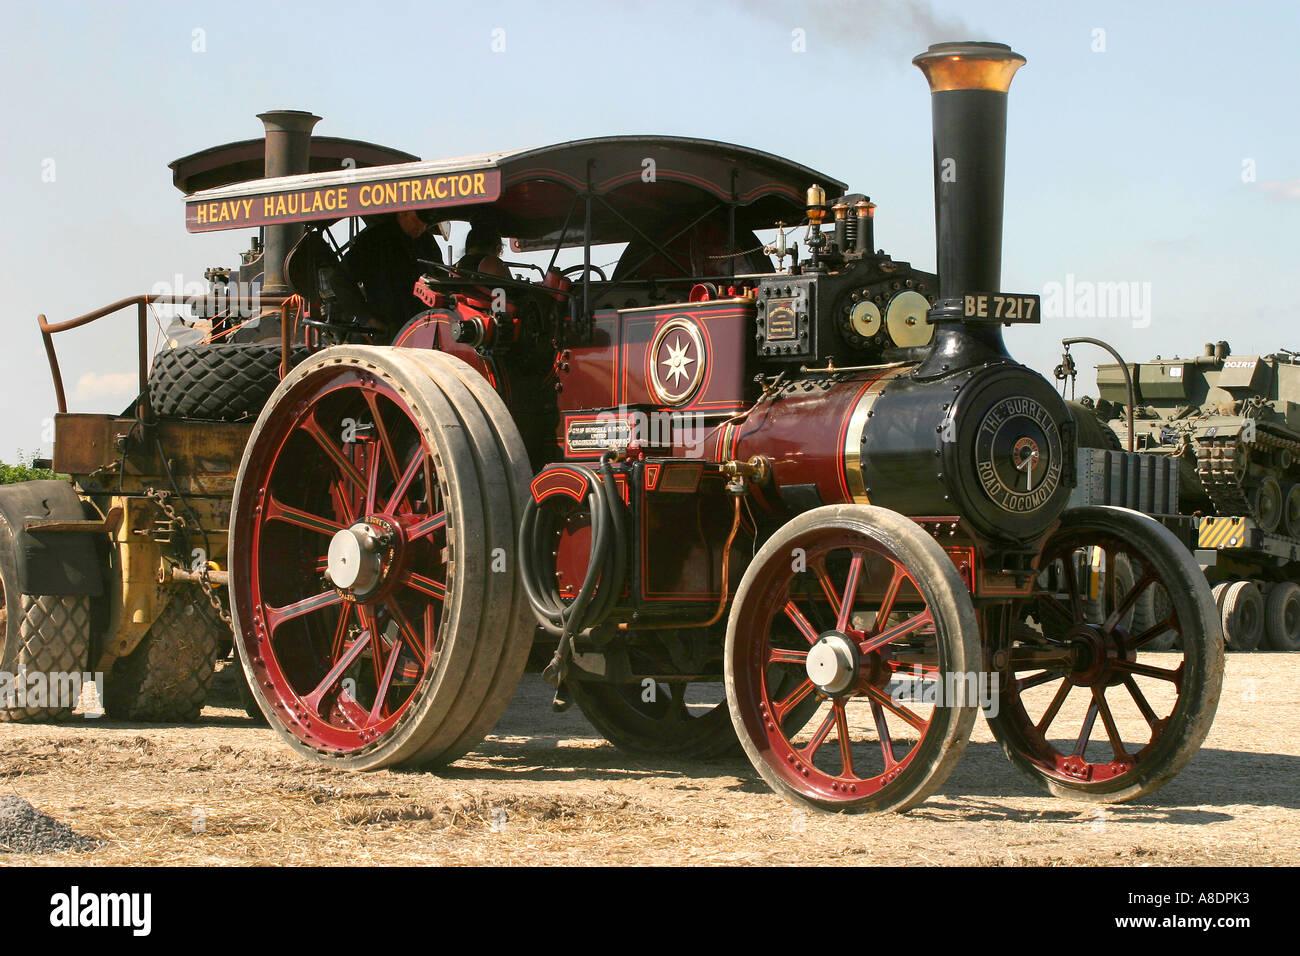 1908 Burrell road locomotive (3057) reg BE7217 'Lord Roberts' at the Dorset Steam Fair, England, UK. - Stock Image